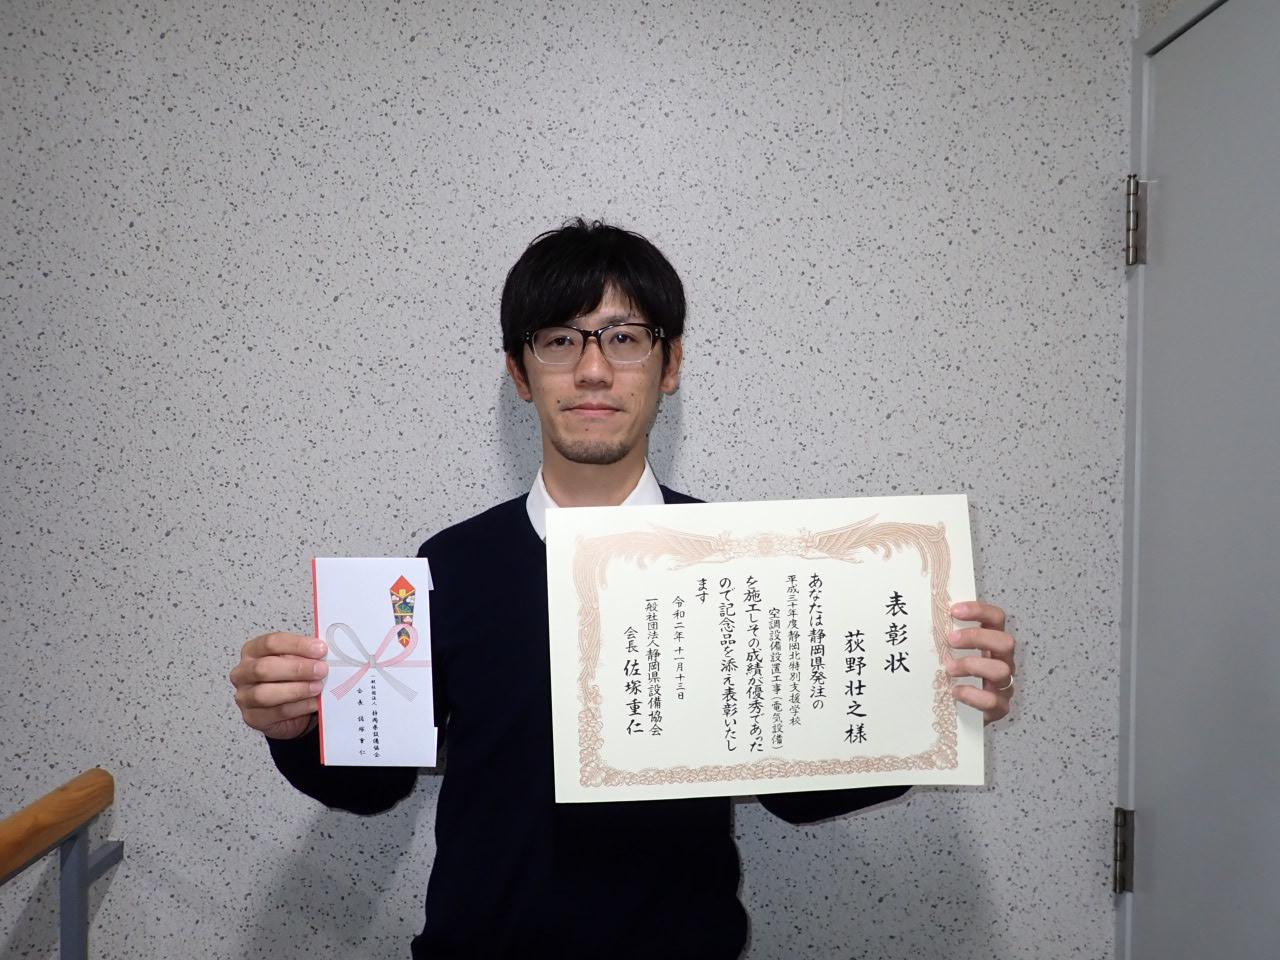 静岡県設備協会より表彰